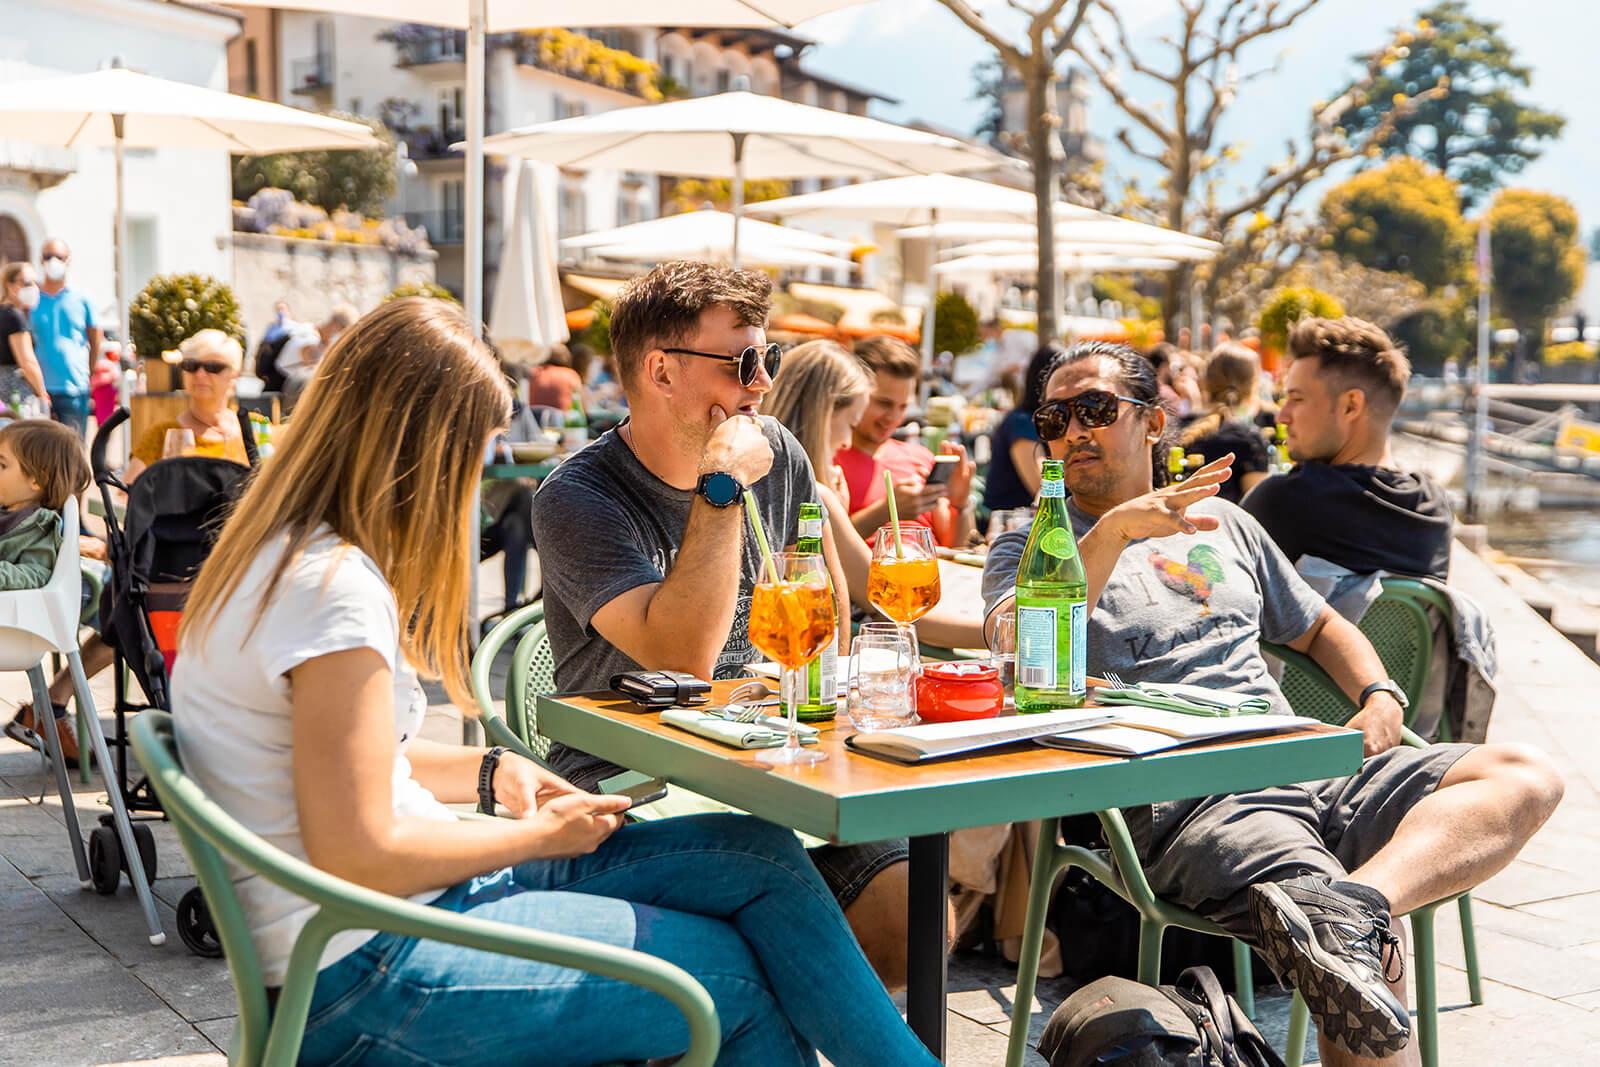 Ascona Outdoor Restaurant Seating in Ticino Switzerland